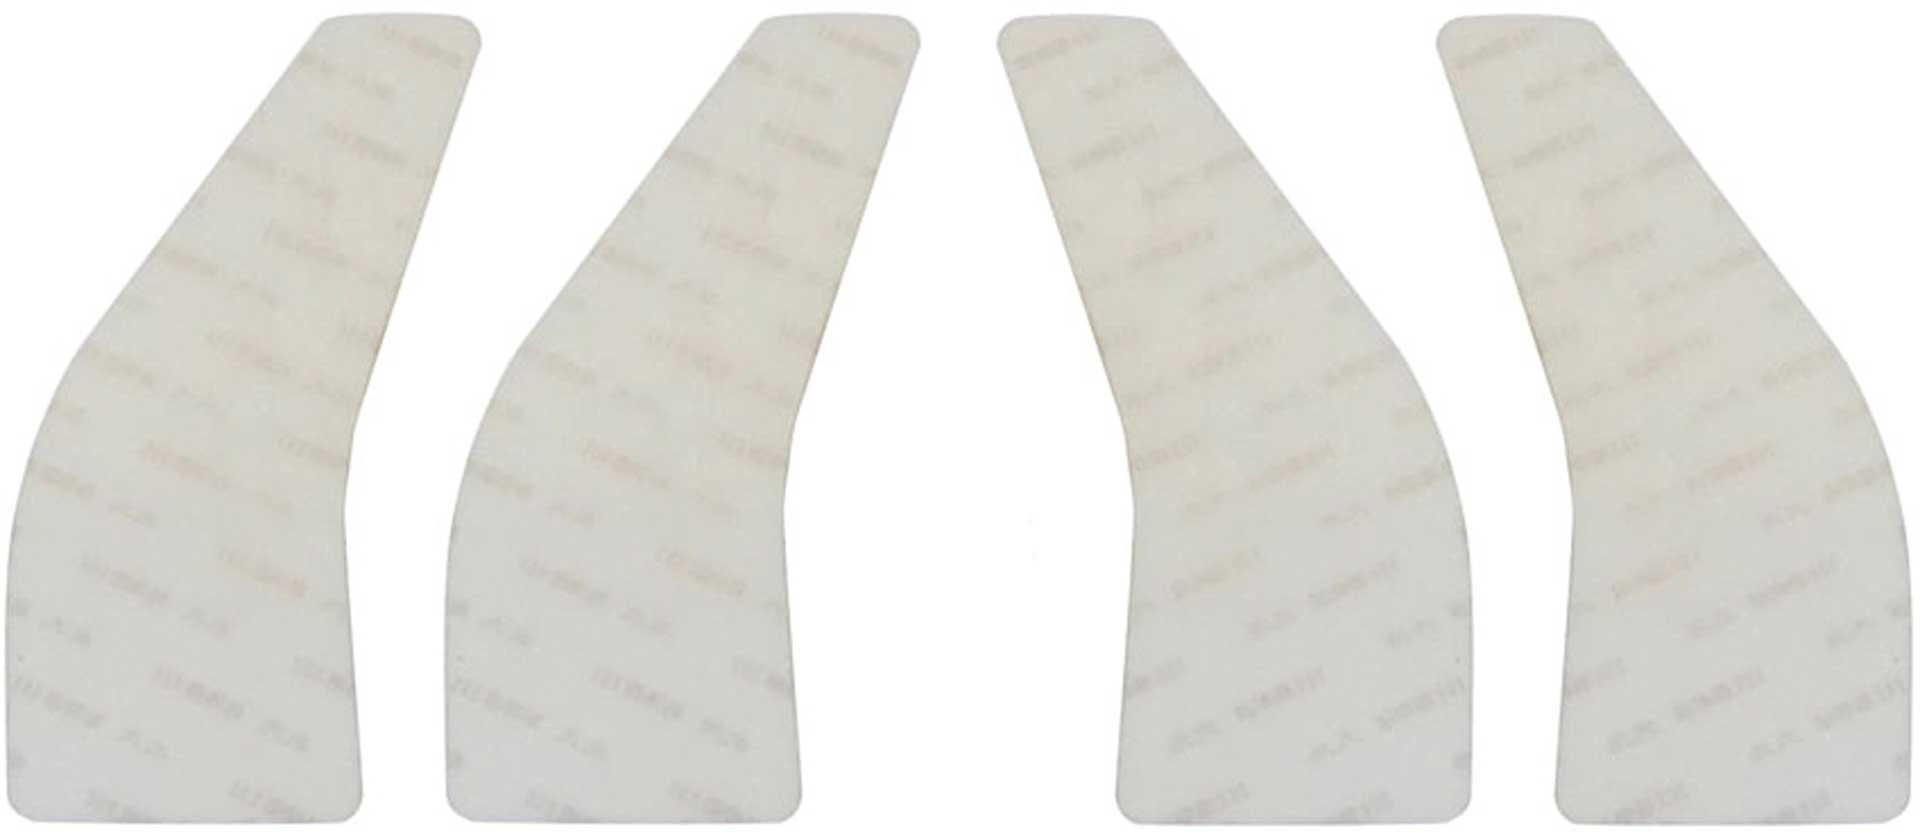 Premier Aircraft Flexjet Oberflächenverstärkung für Tragfläche